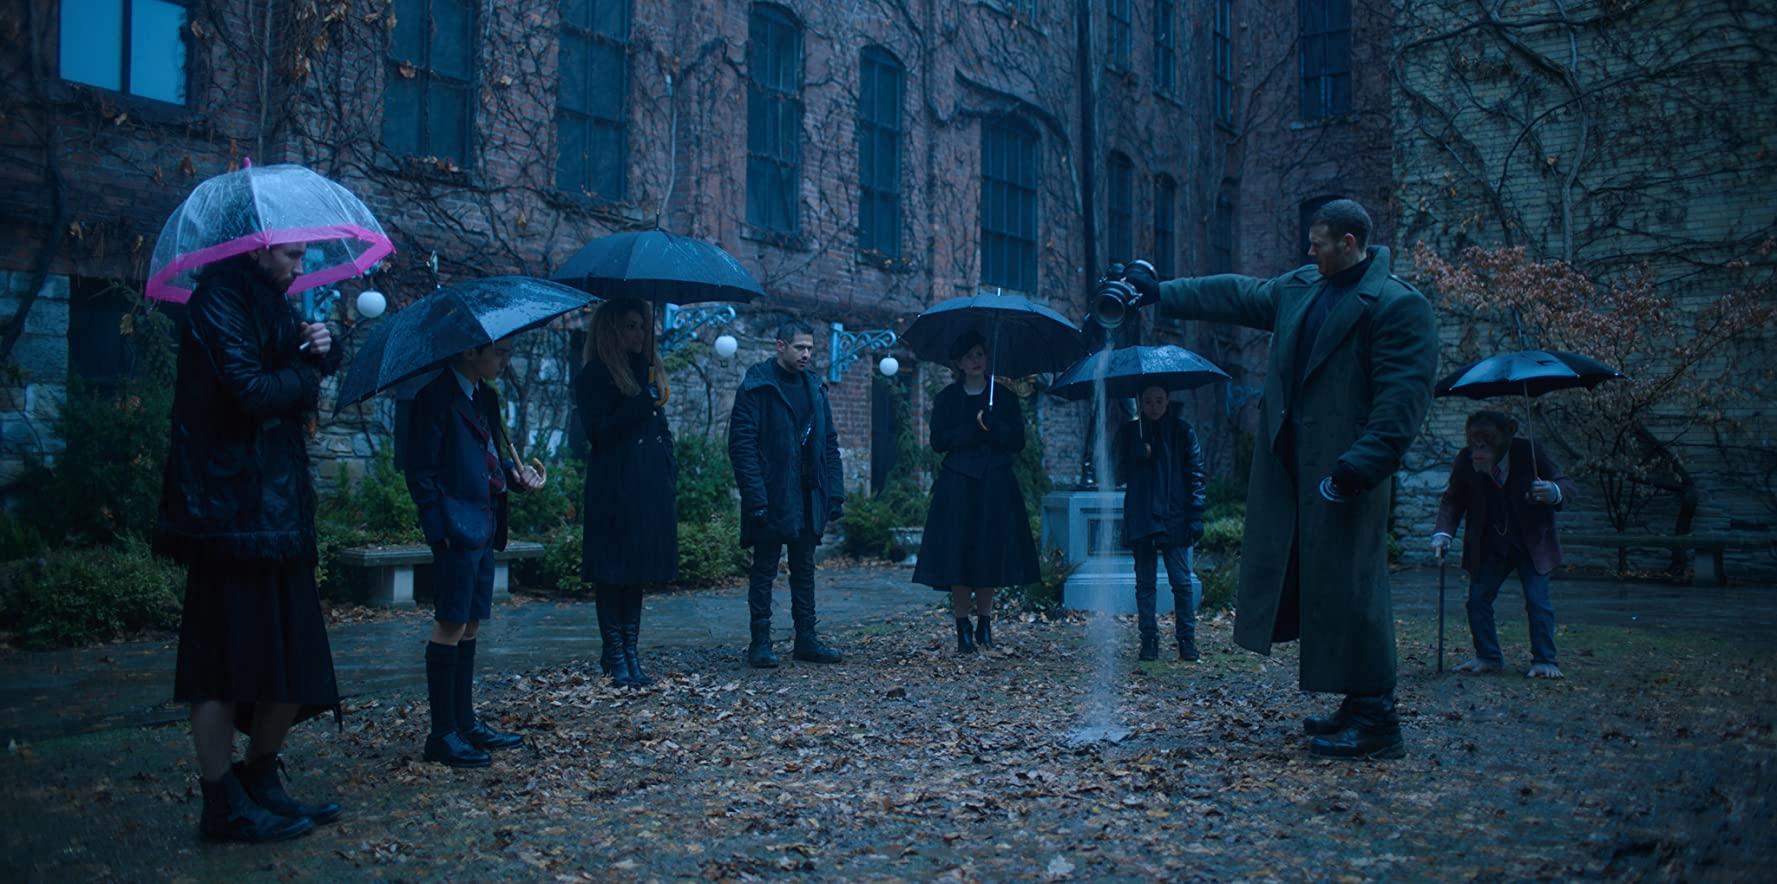 'The Umbrella Academy'